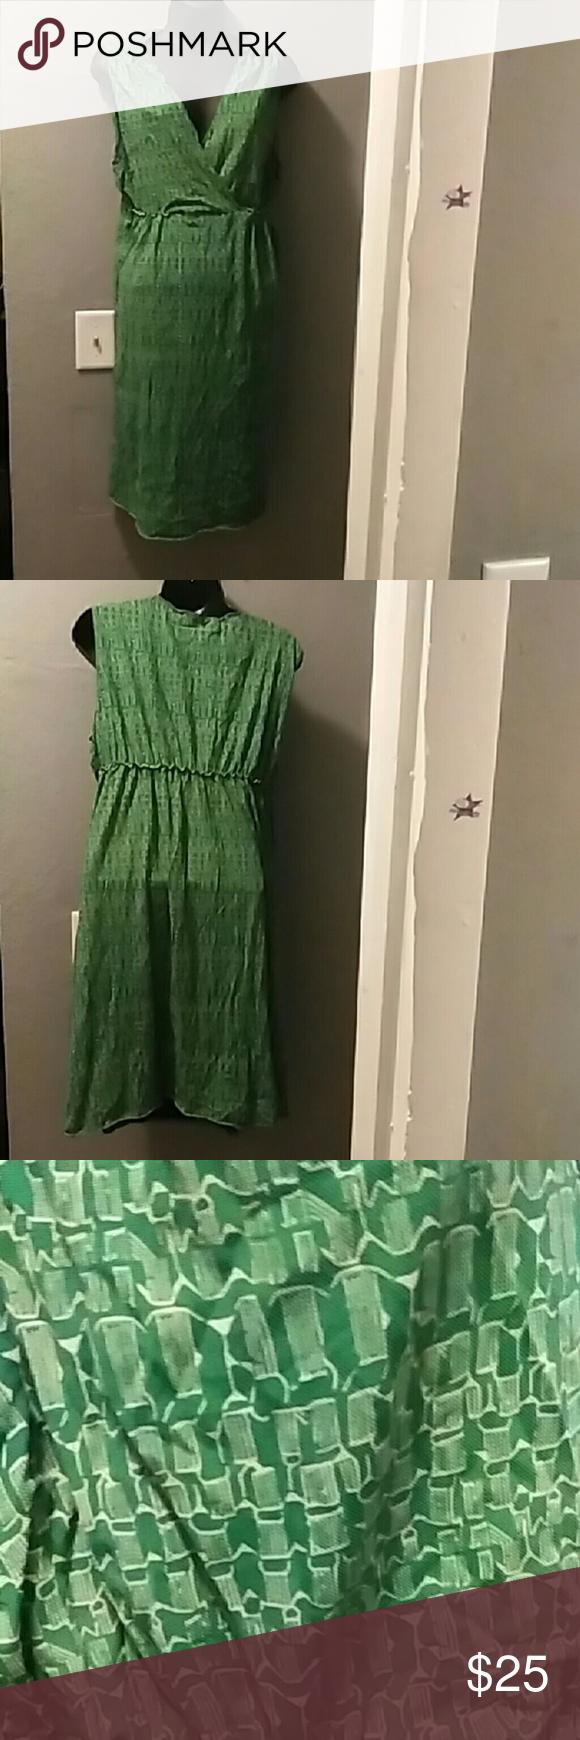 M P P P Pretty Little Summer Dress Pretty Little Summer Dress Knee Length Size 2x M P P P Dresses Summer Dresses Summer Dresses Knee Length Dresses [ 1740 x 580 Pixel ]